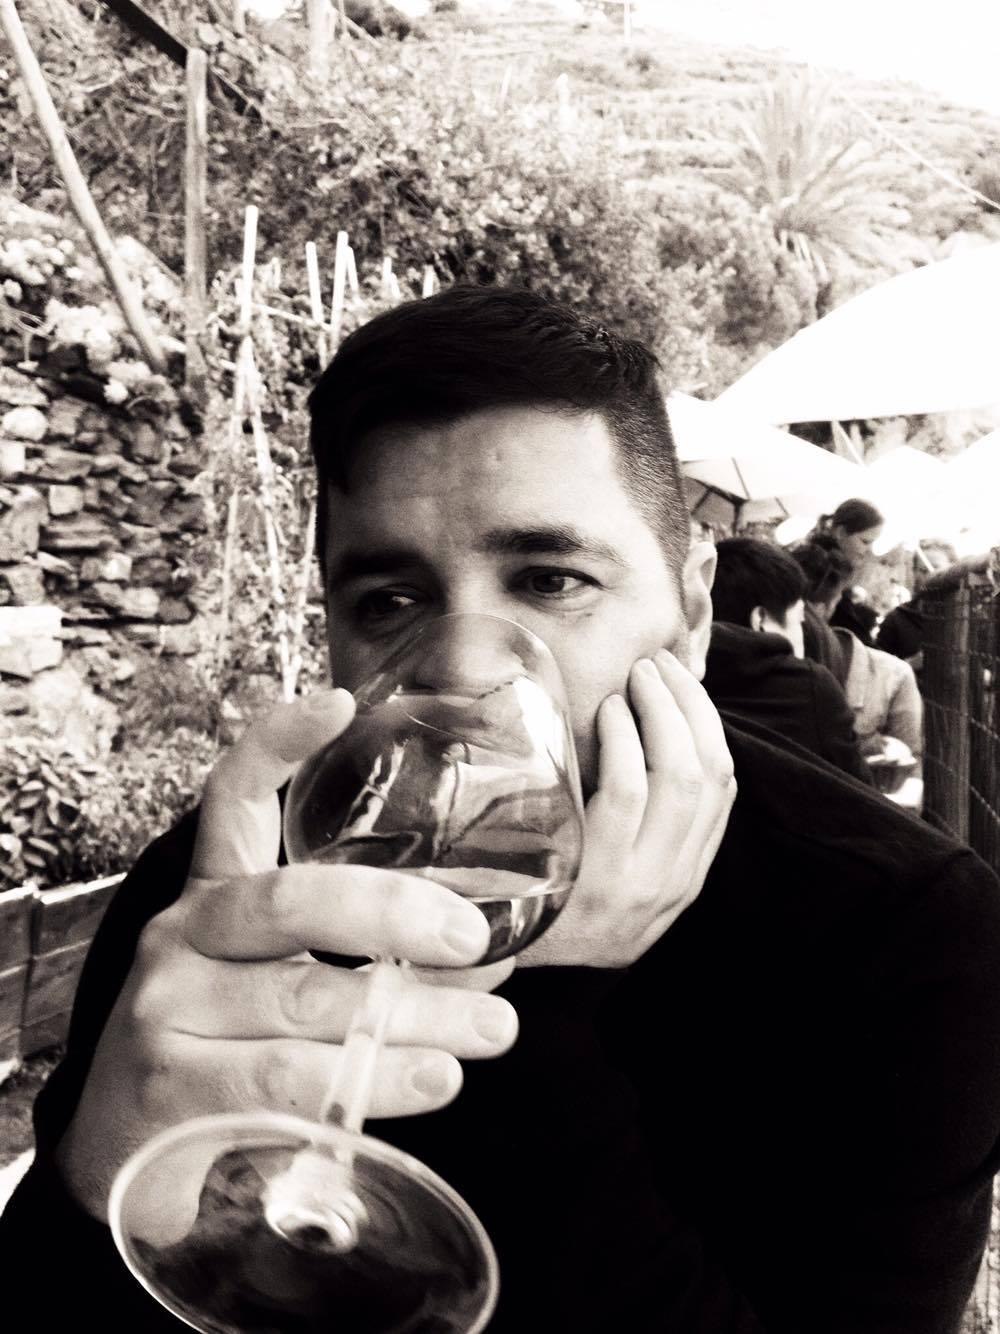 Nathan Aguilera in Cinque Terre